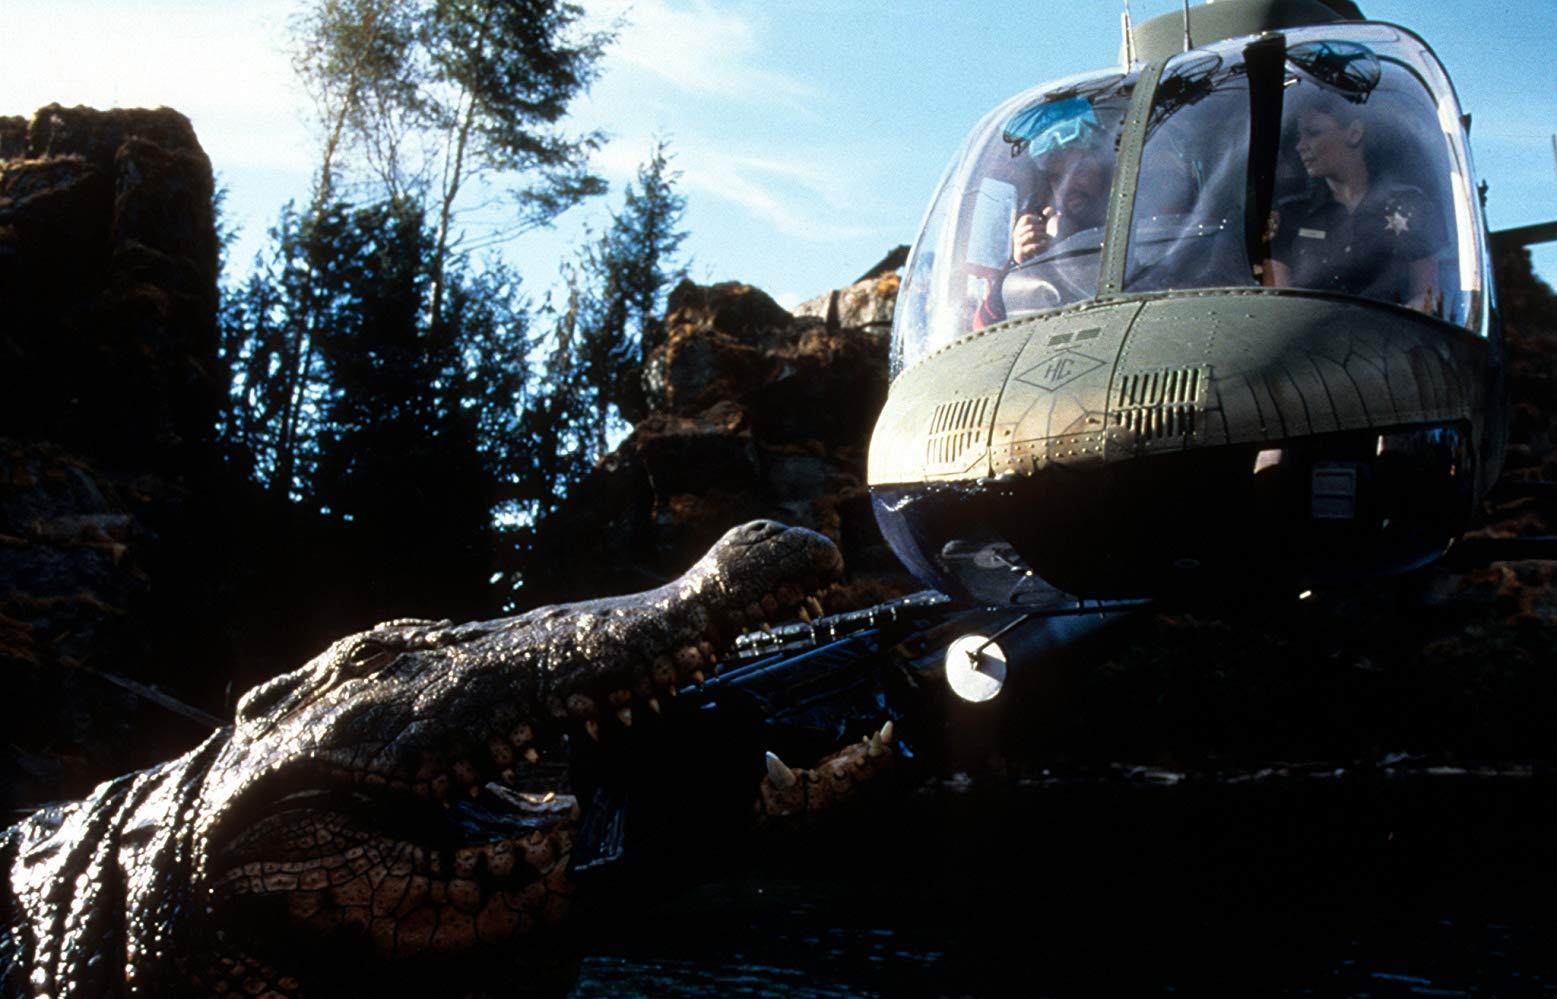 مشاهدة فيلم Lake Placid 1999 HD مترجم كامل اون لاين